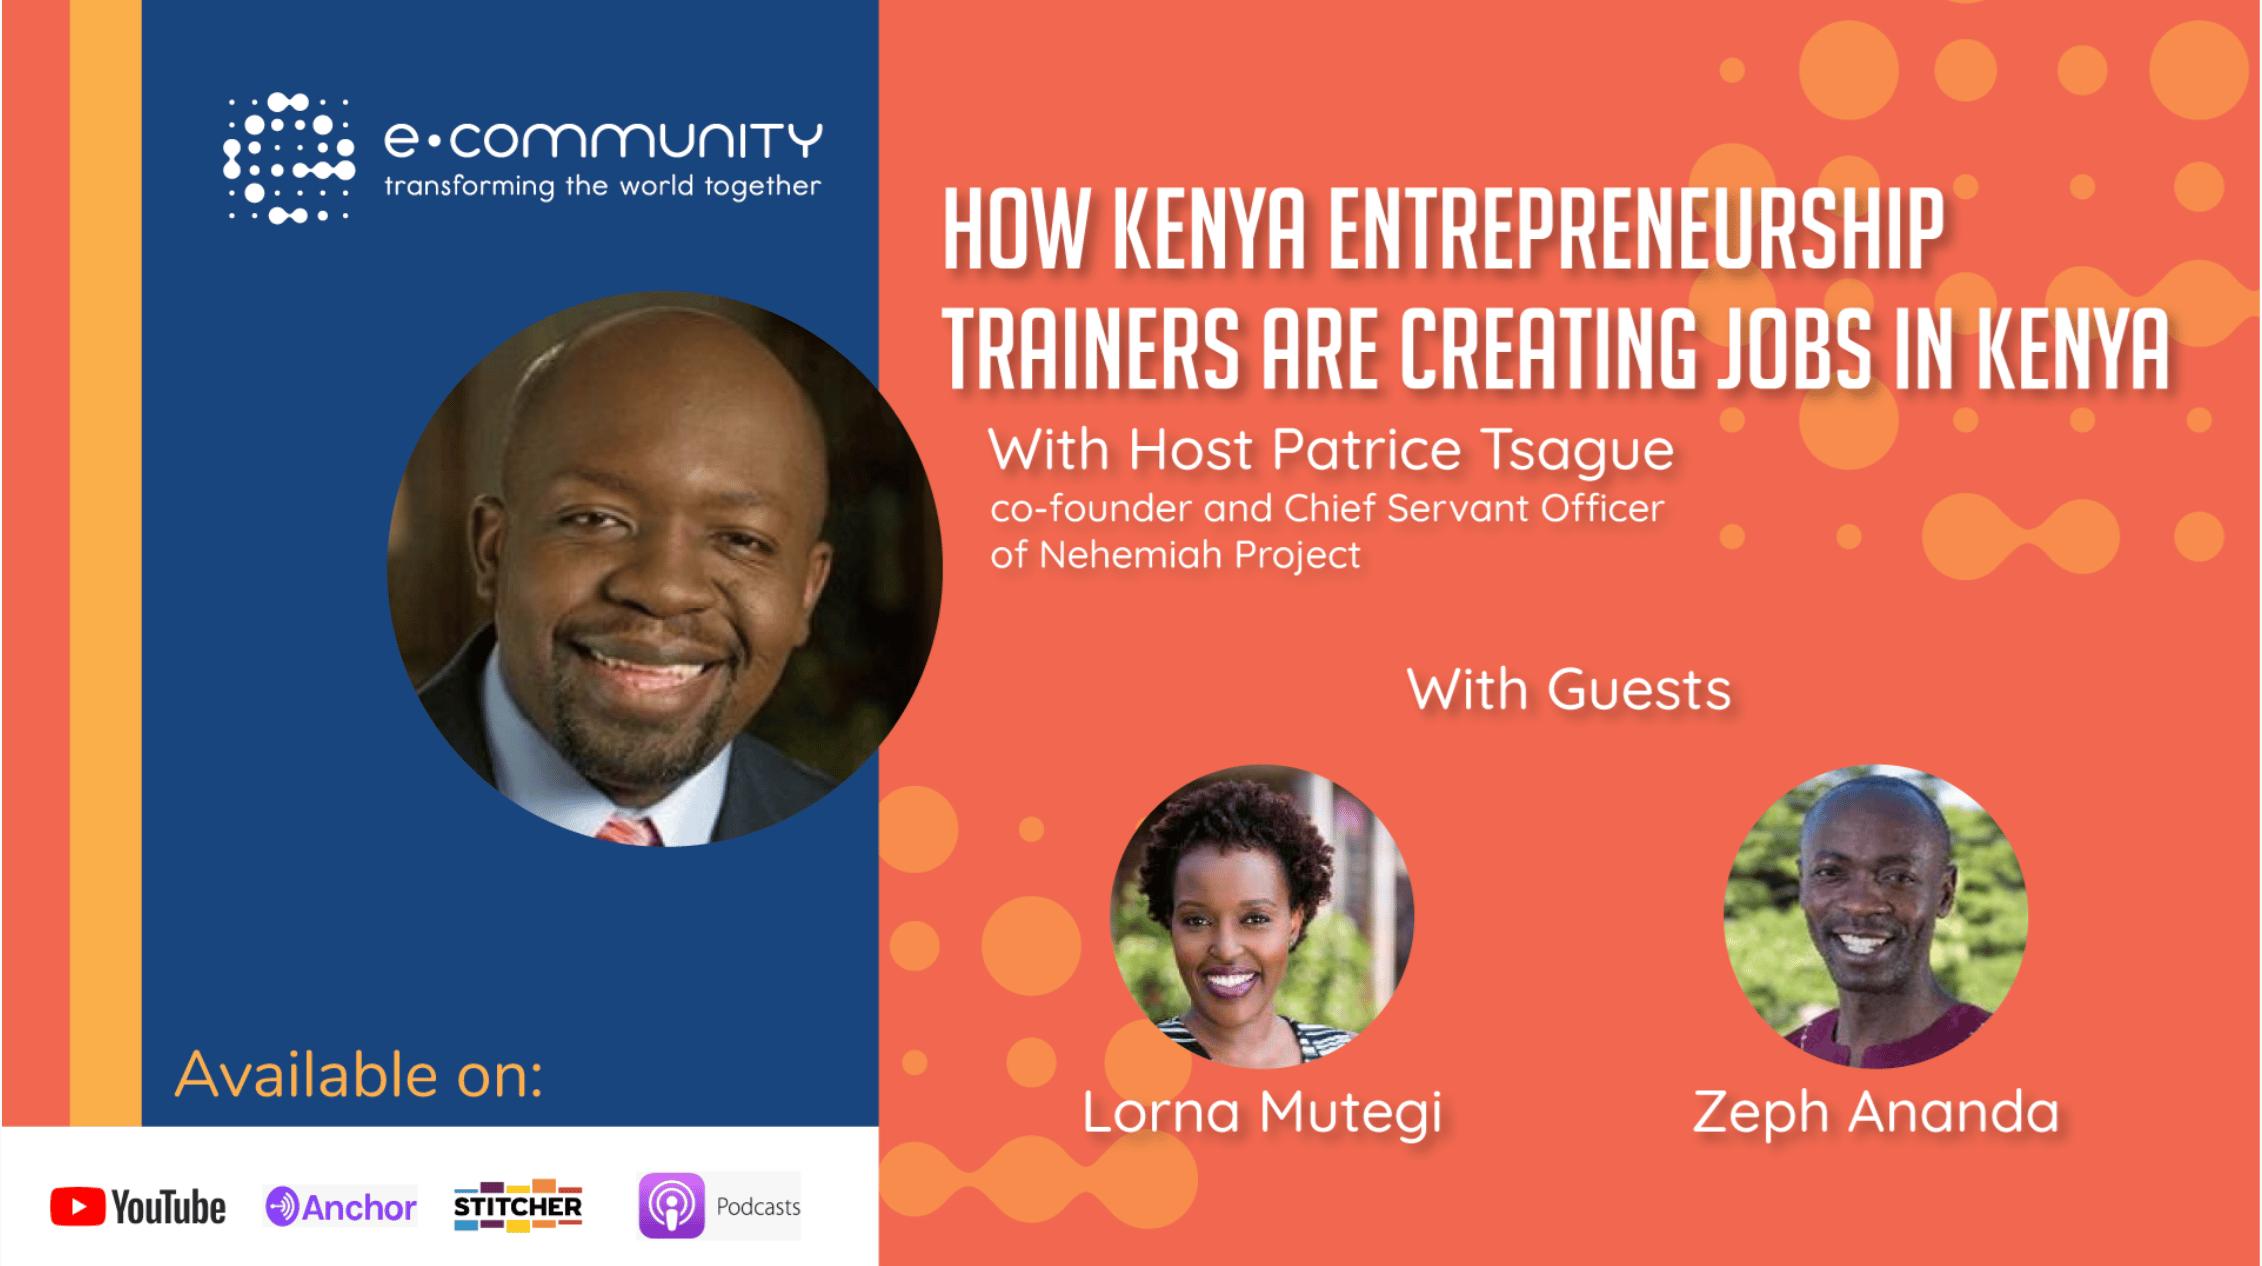 How Entrepreneurship Trainers are Creating Jobs in Kenya.